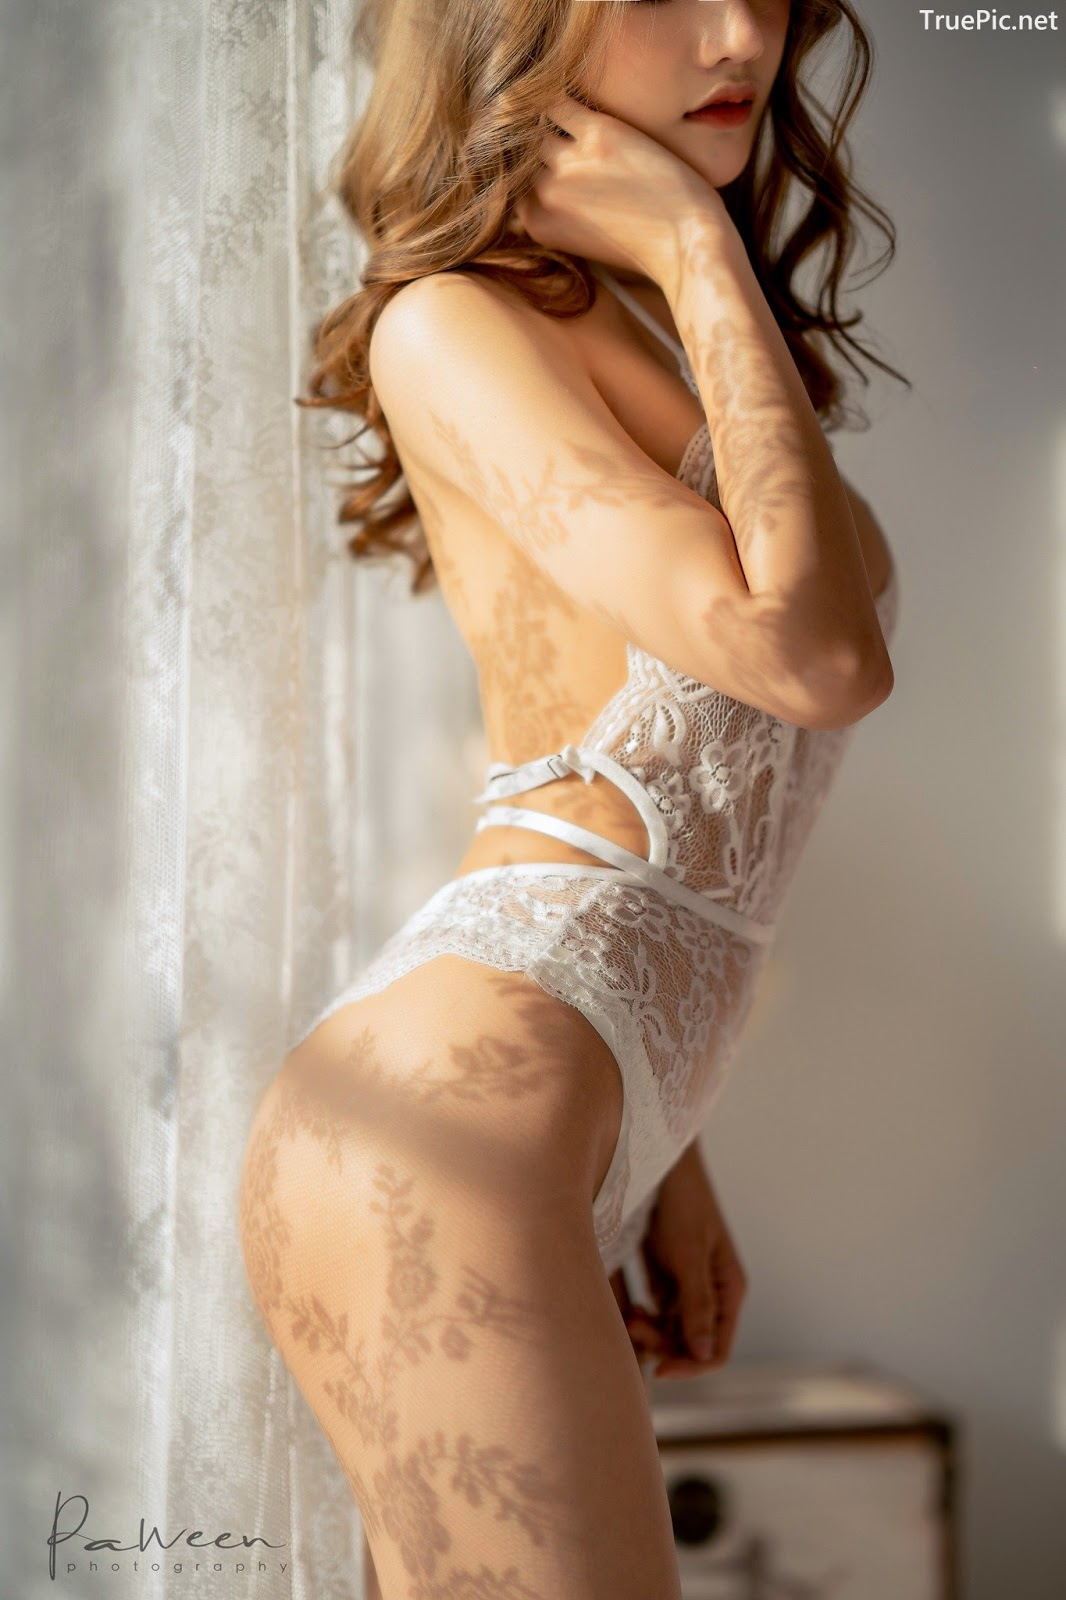 Image Thailand Model - Atittaya Chaiyasing - White Lace Lingerie - TruePic.net - Picture-6